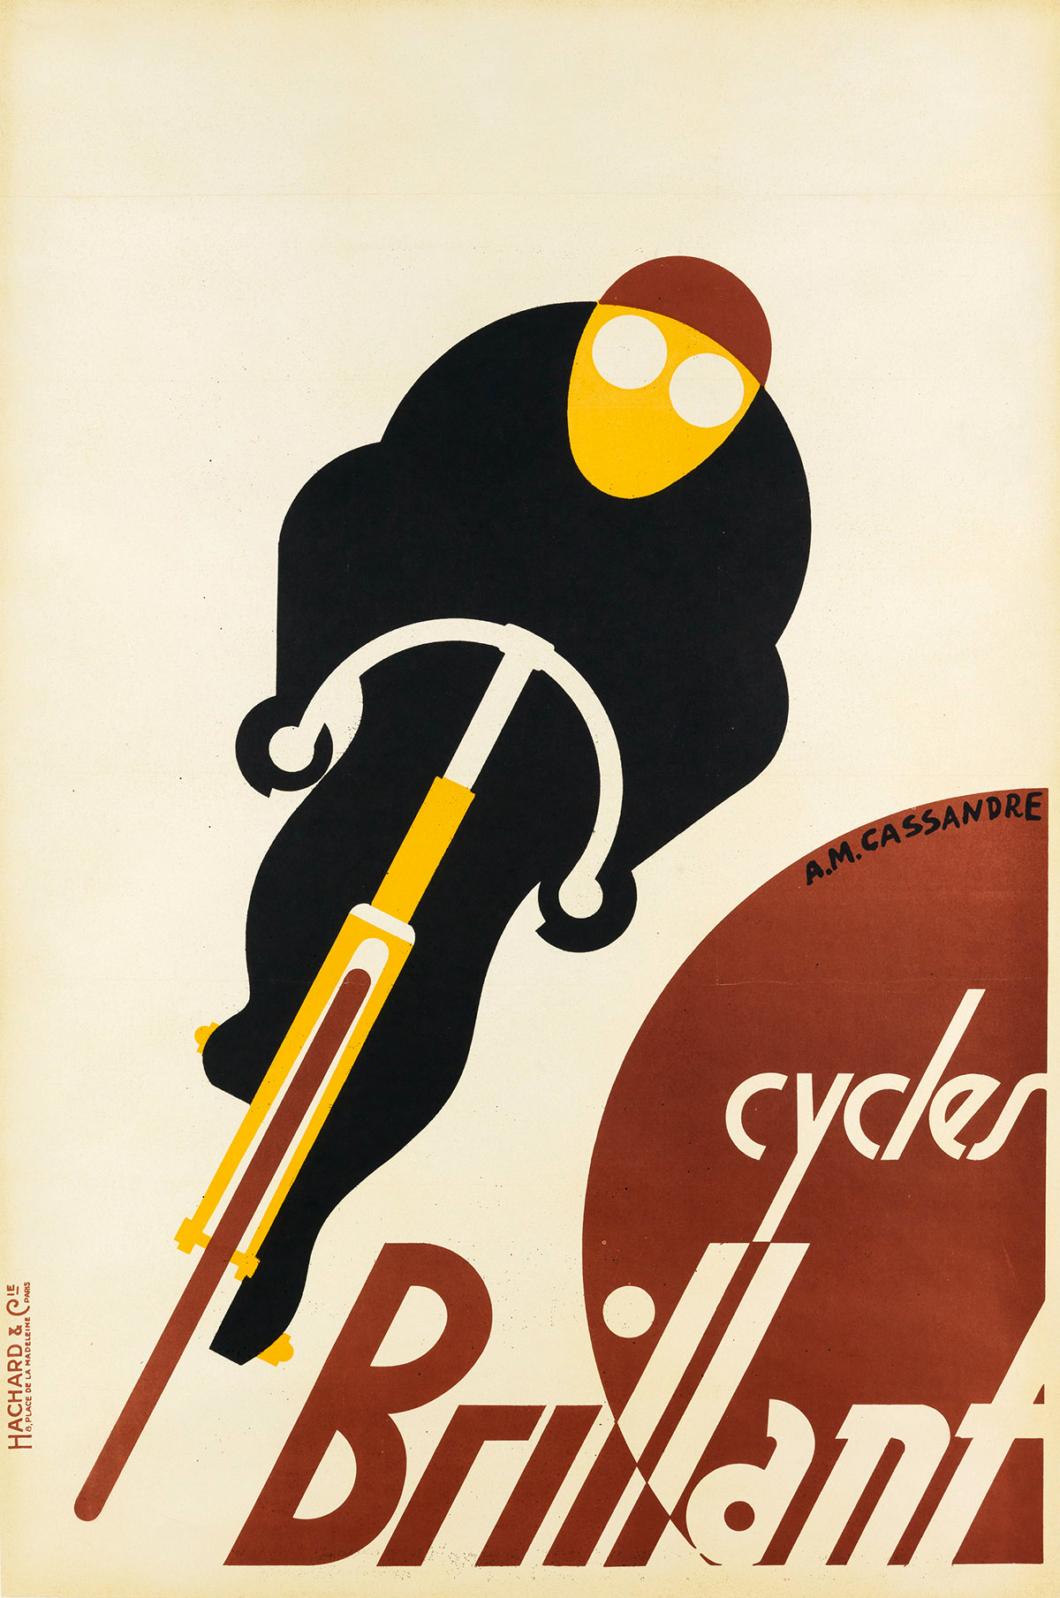 Cycles Brilliant 1925